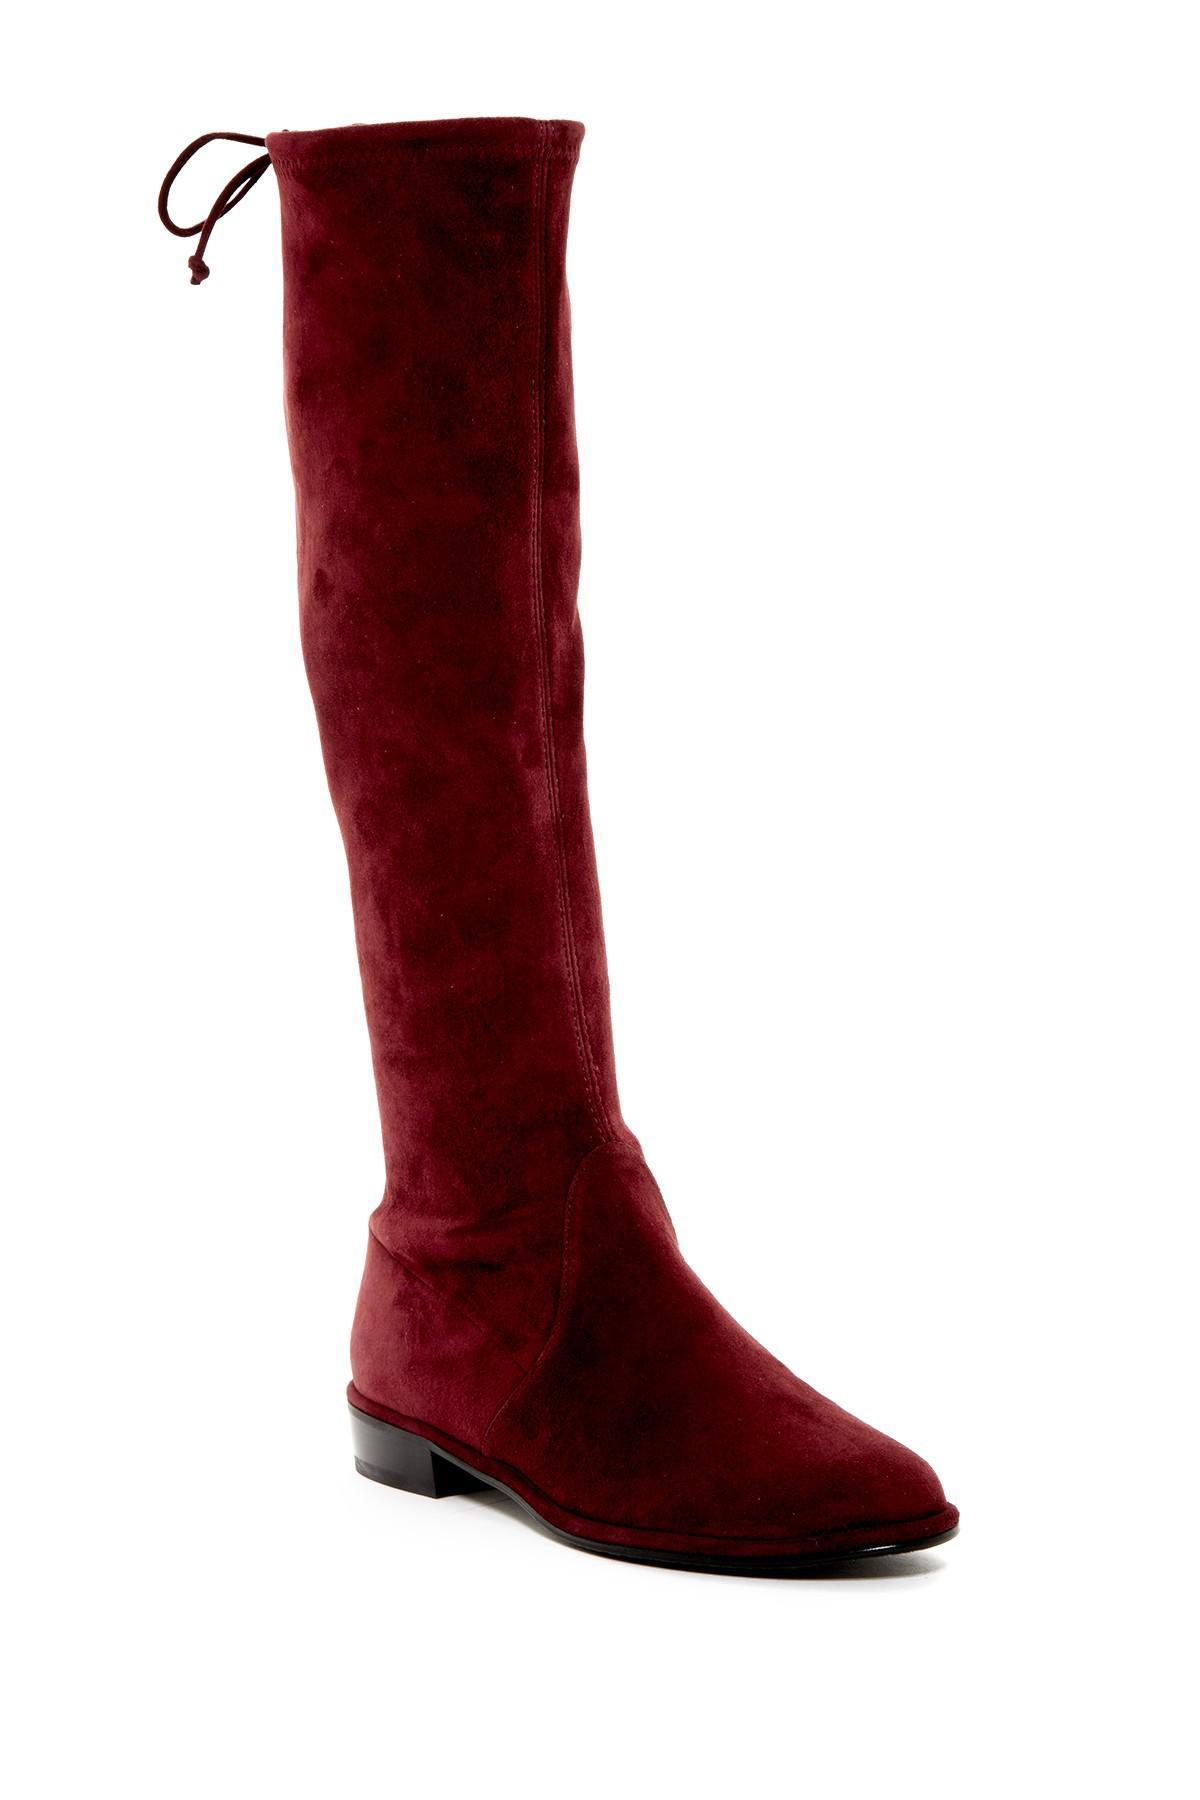 Stuart Weitzman Kneezie High Boot - Wide Width Available Df8H8OPX3j